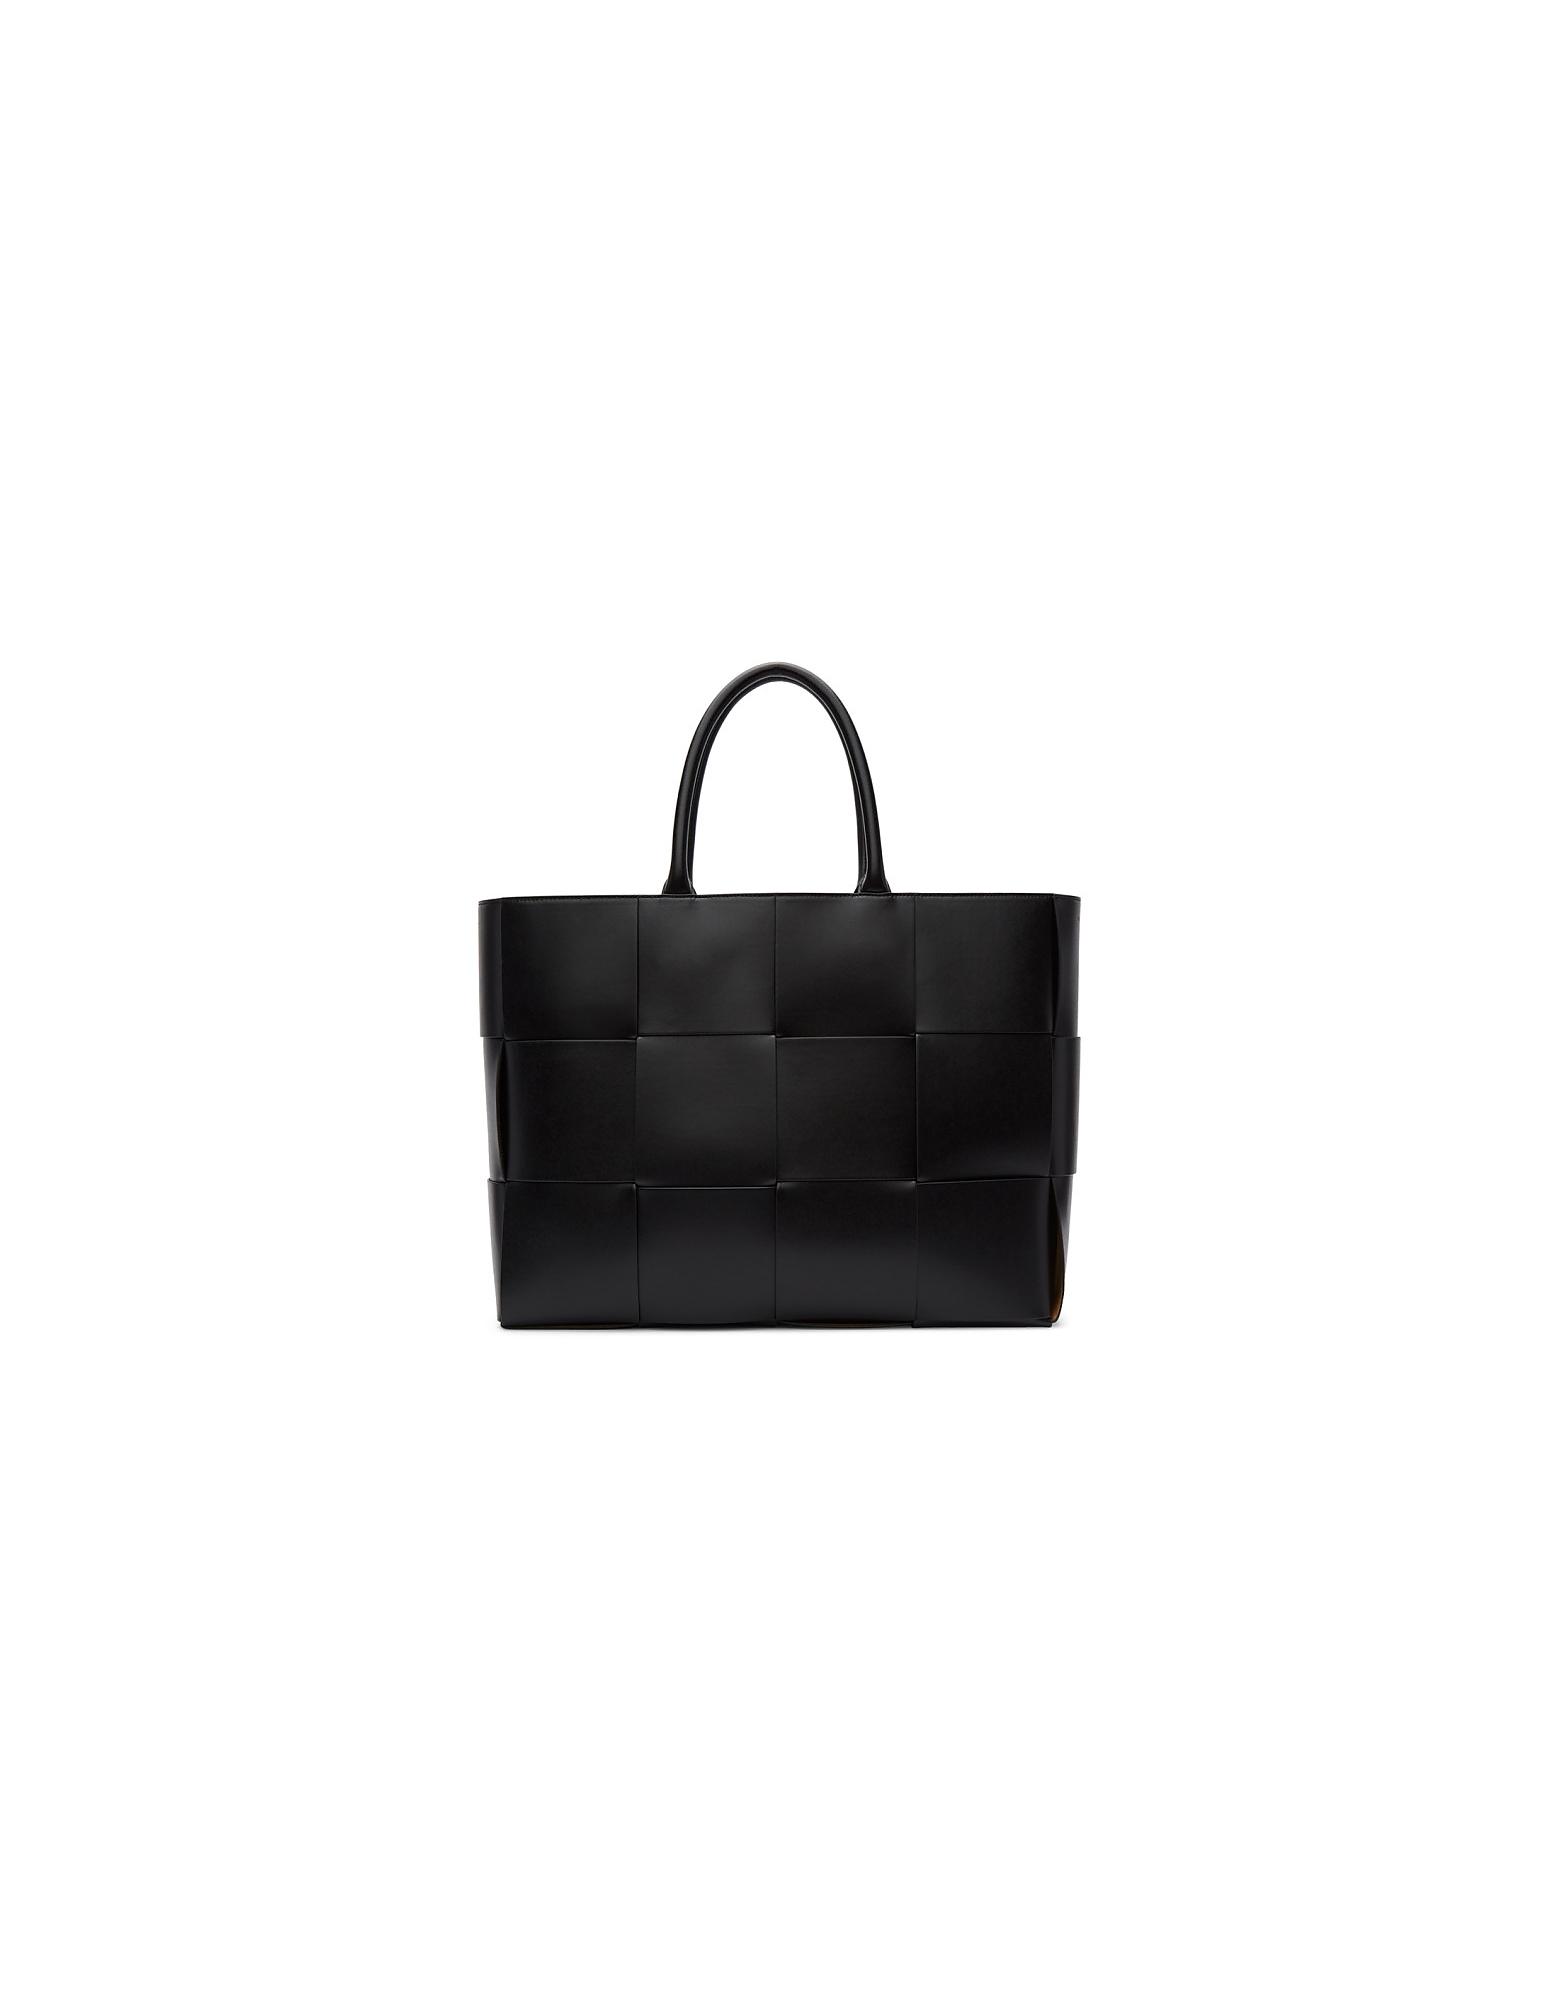 Bottega Veneta Designer Handbags, Black Leather Urban Tote